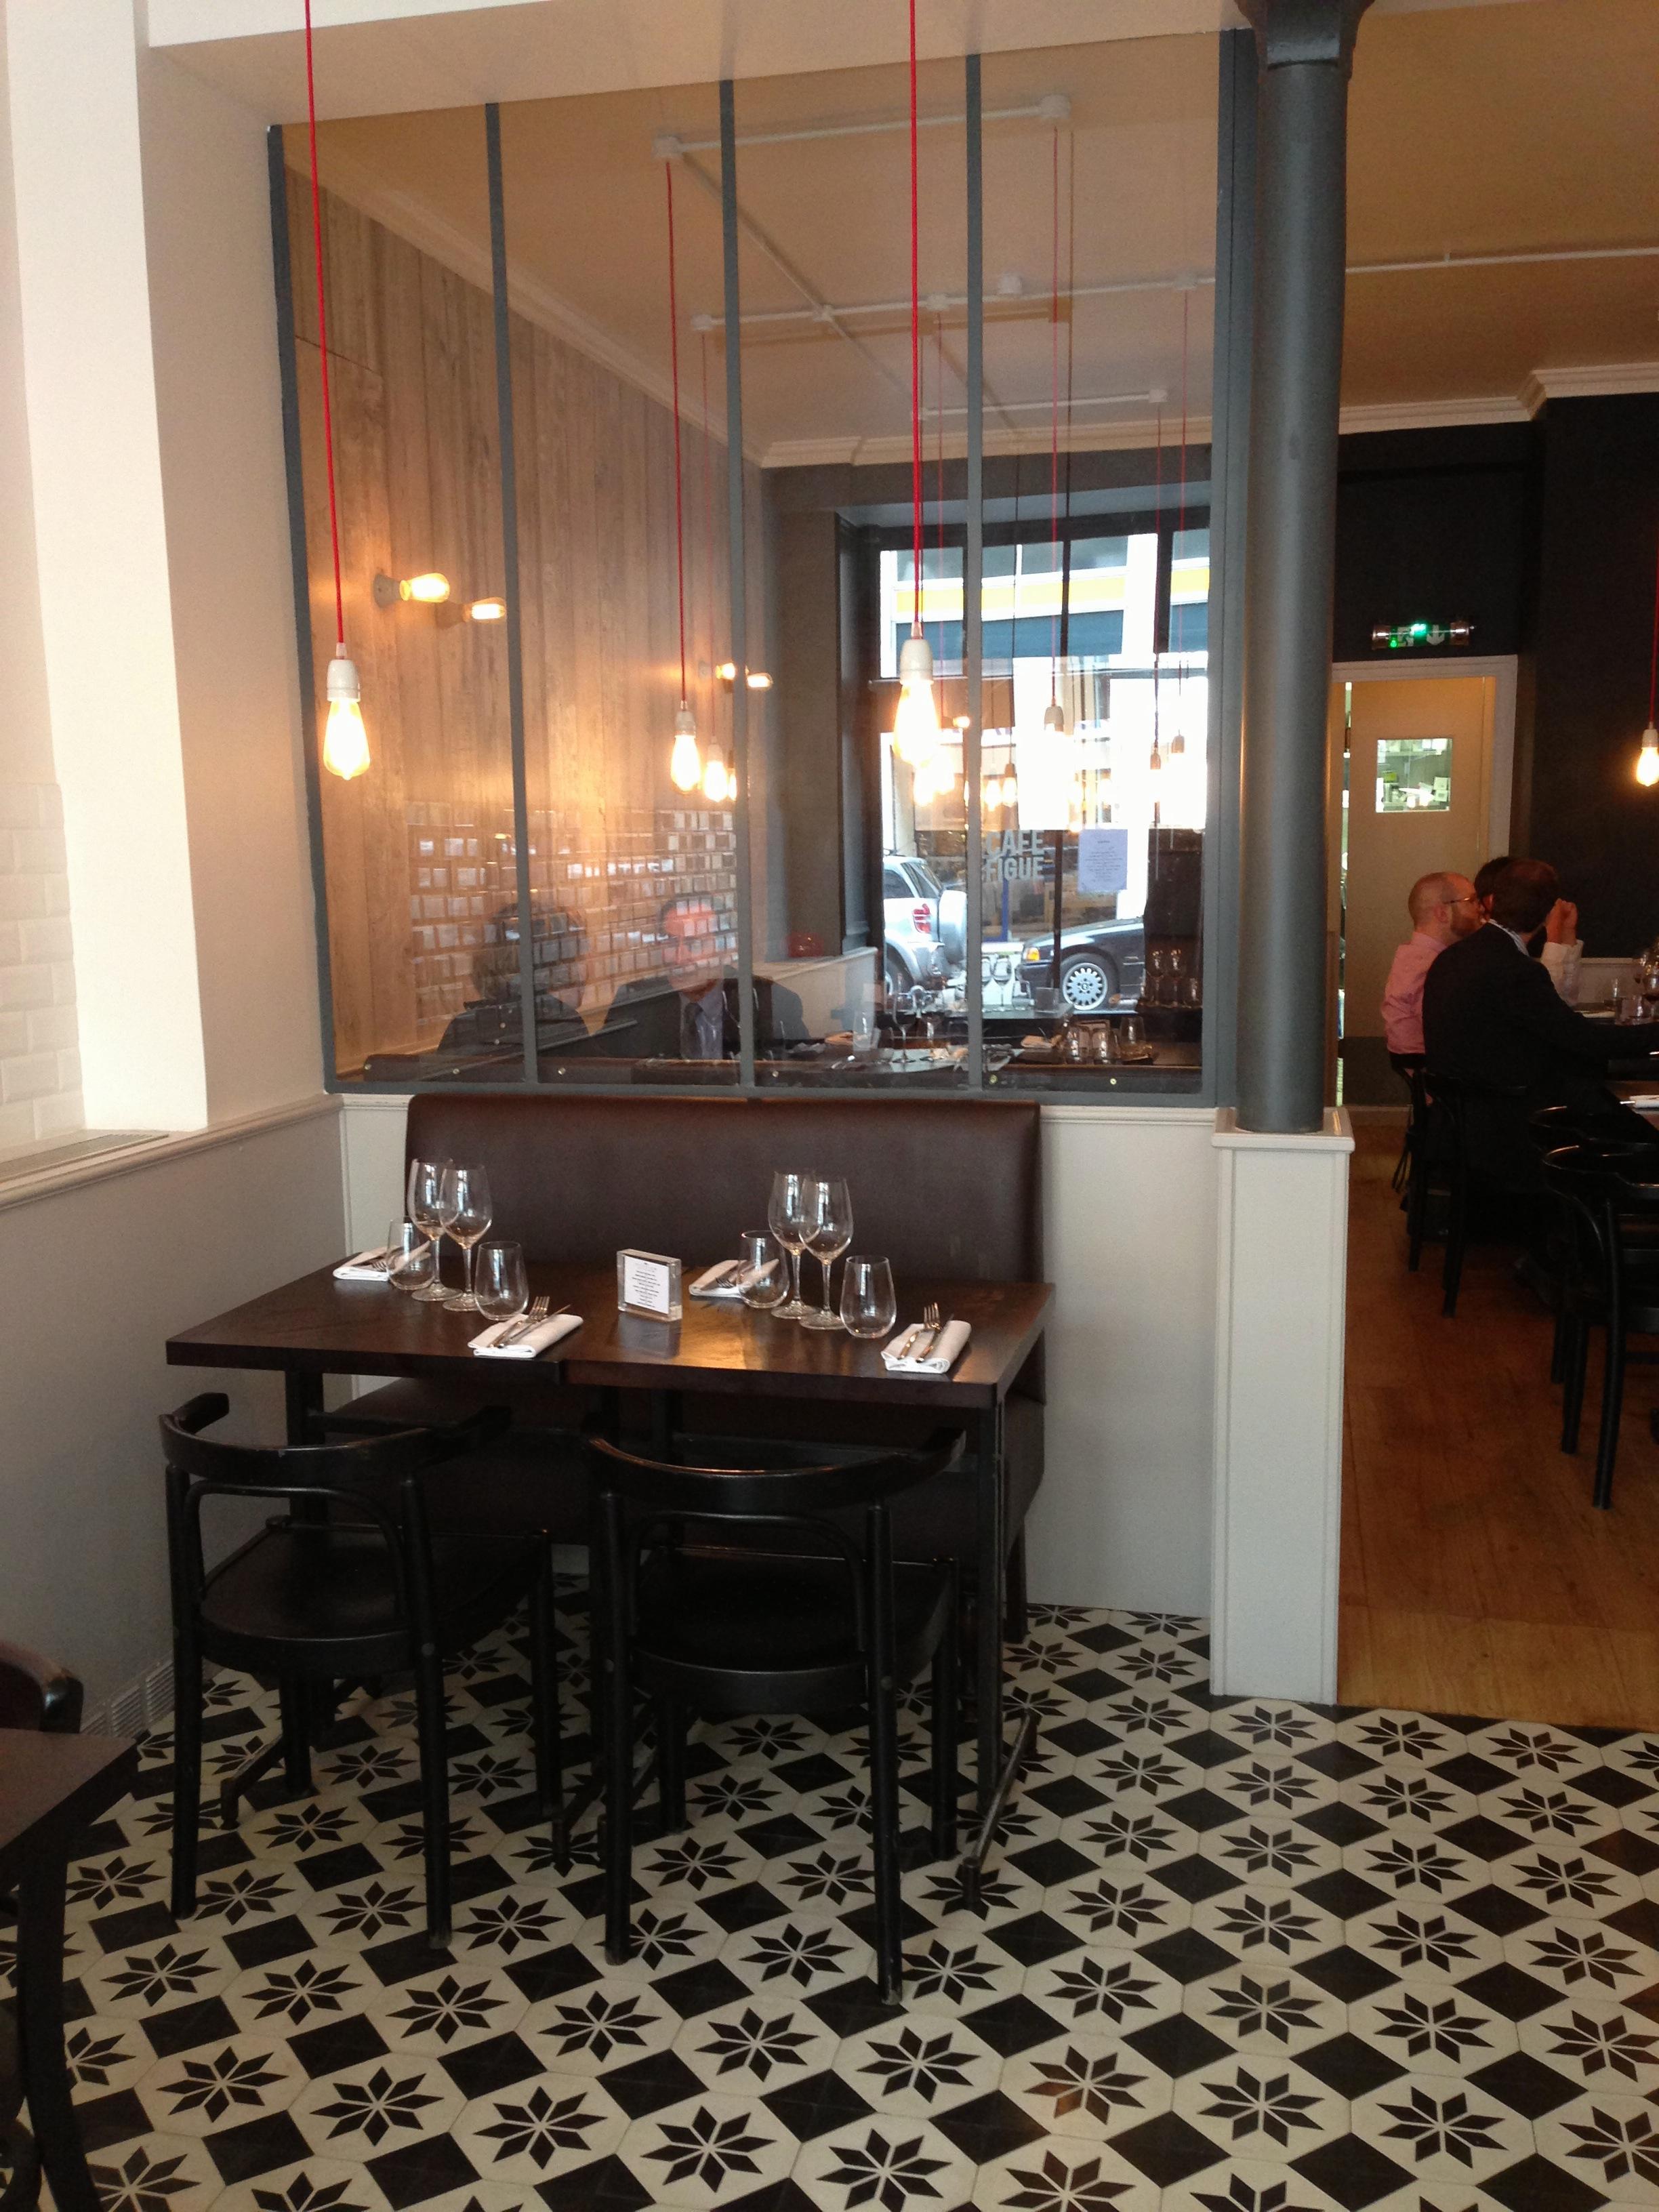 Restaurant Food Fusion Caf Figue Rencontre Des Cultures